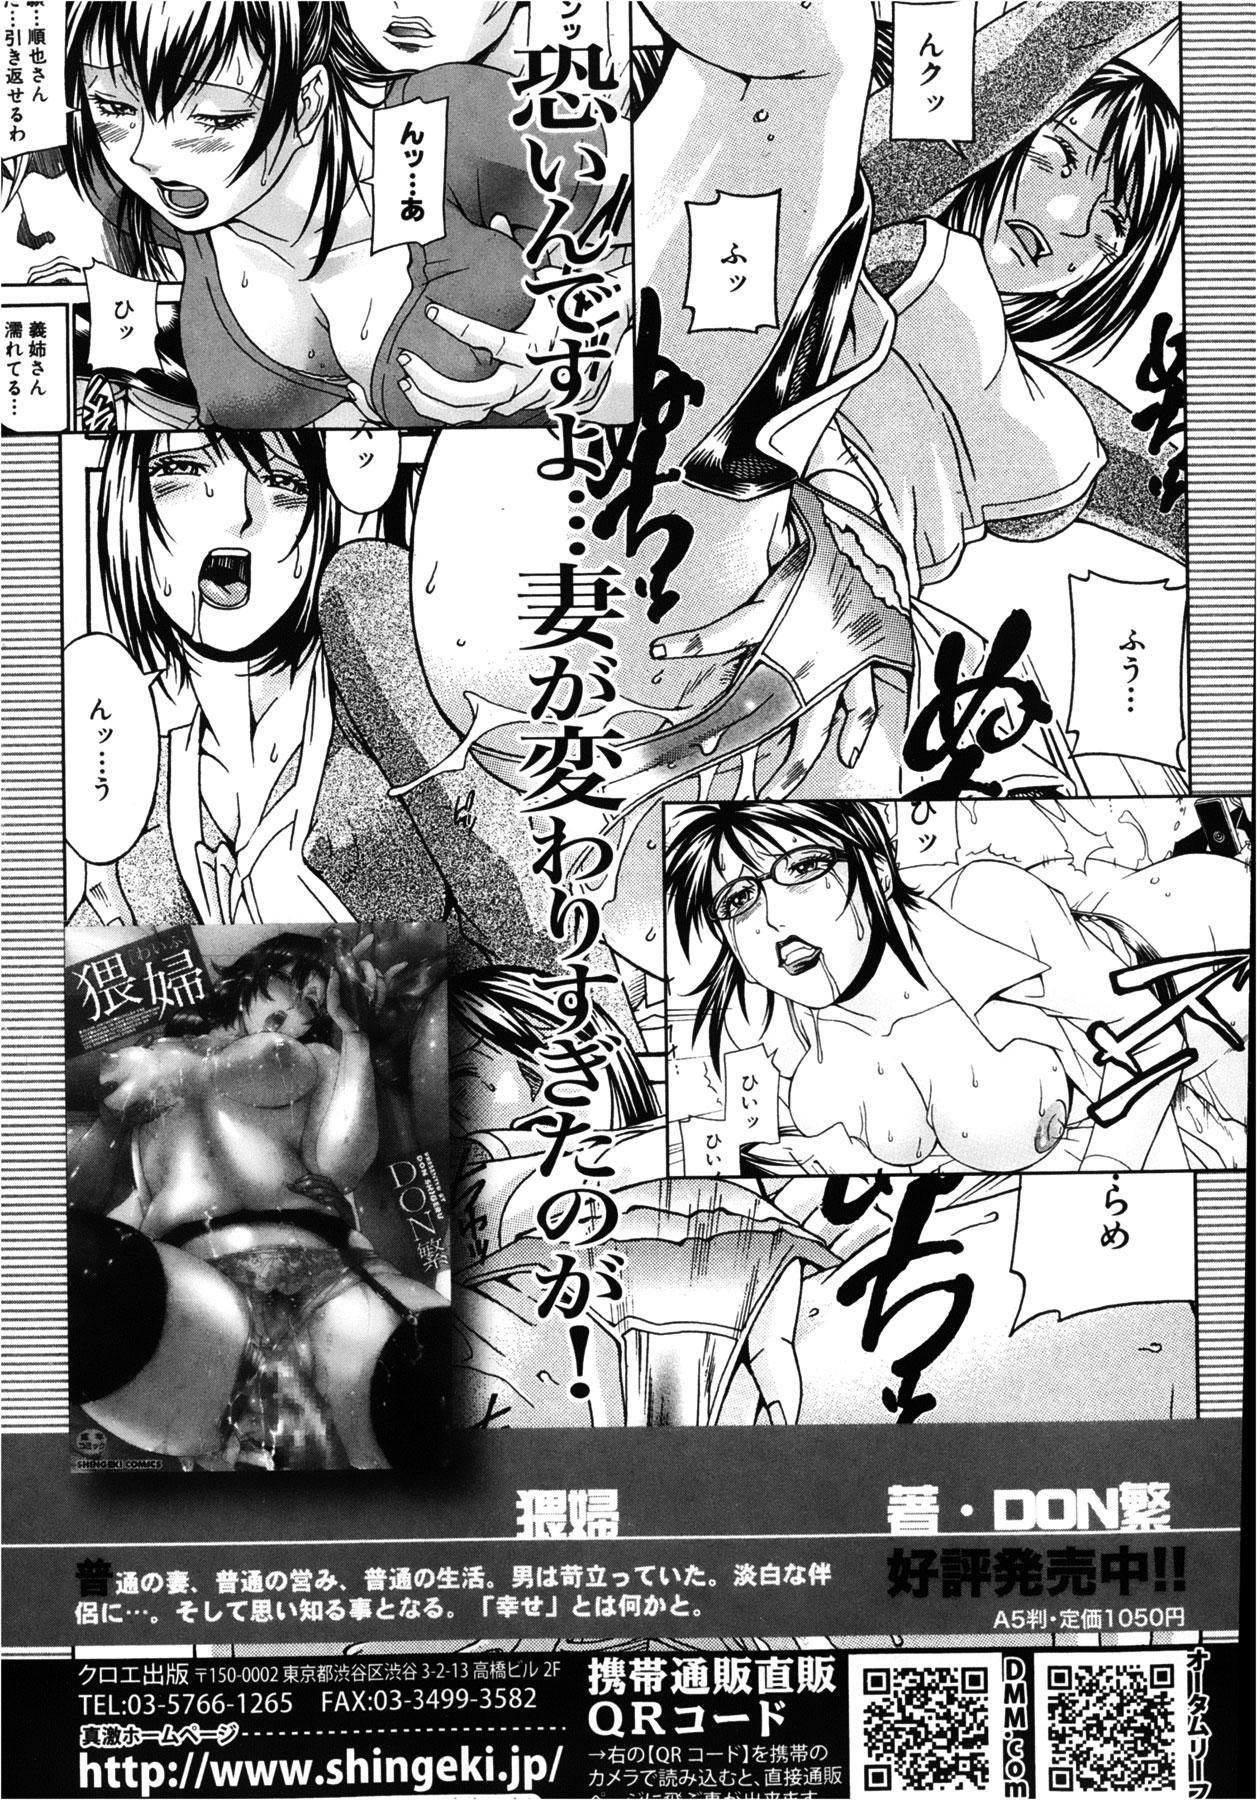 COMIC Shingeki 2013-02 246